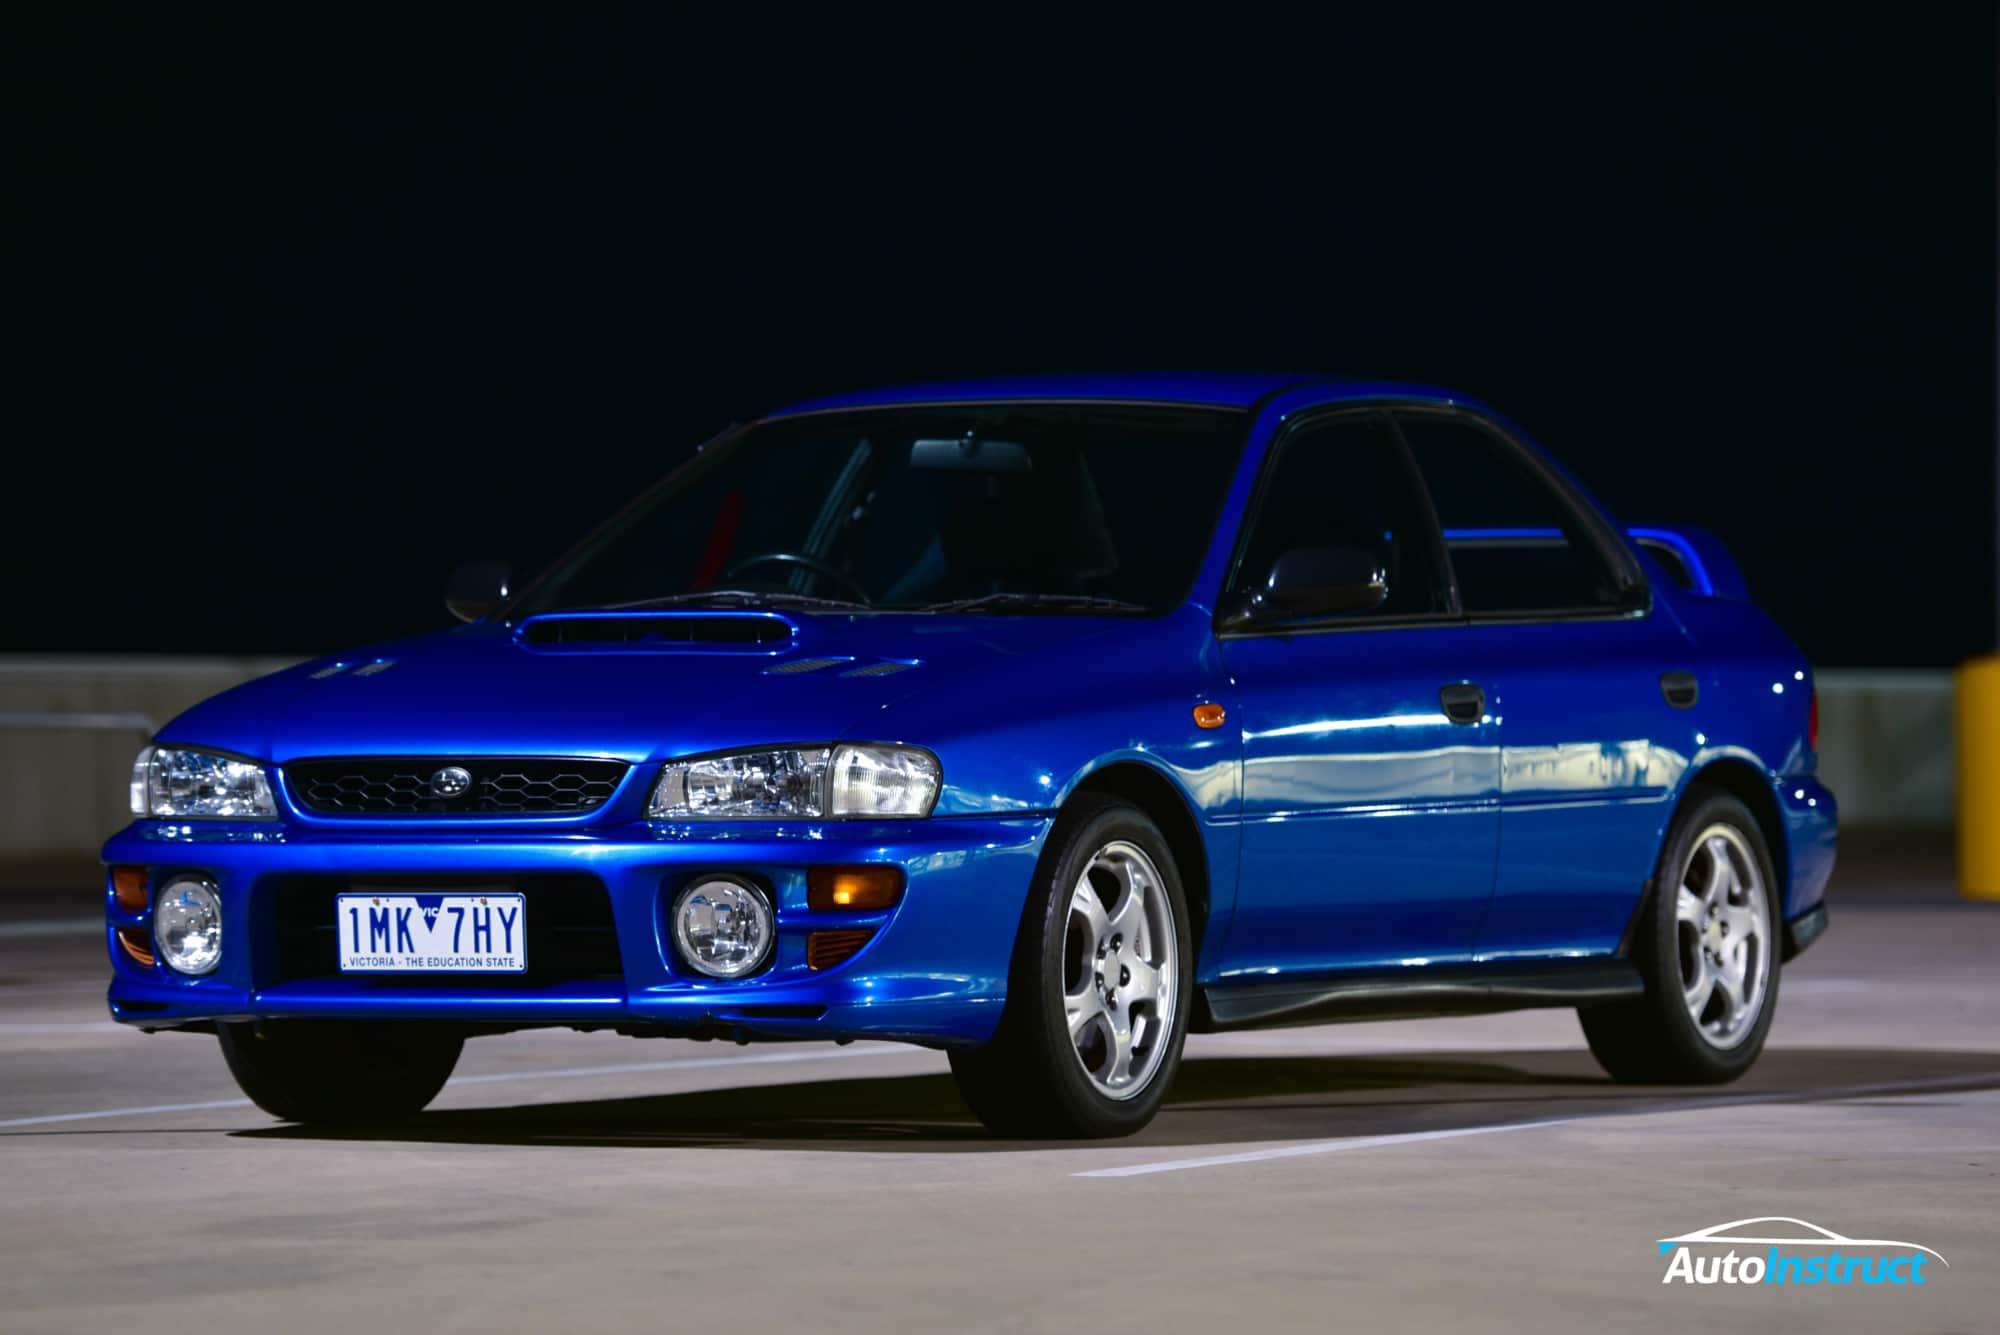 GC8 Subaru Impreza WRX